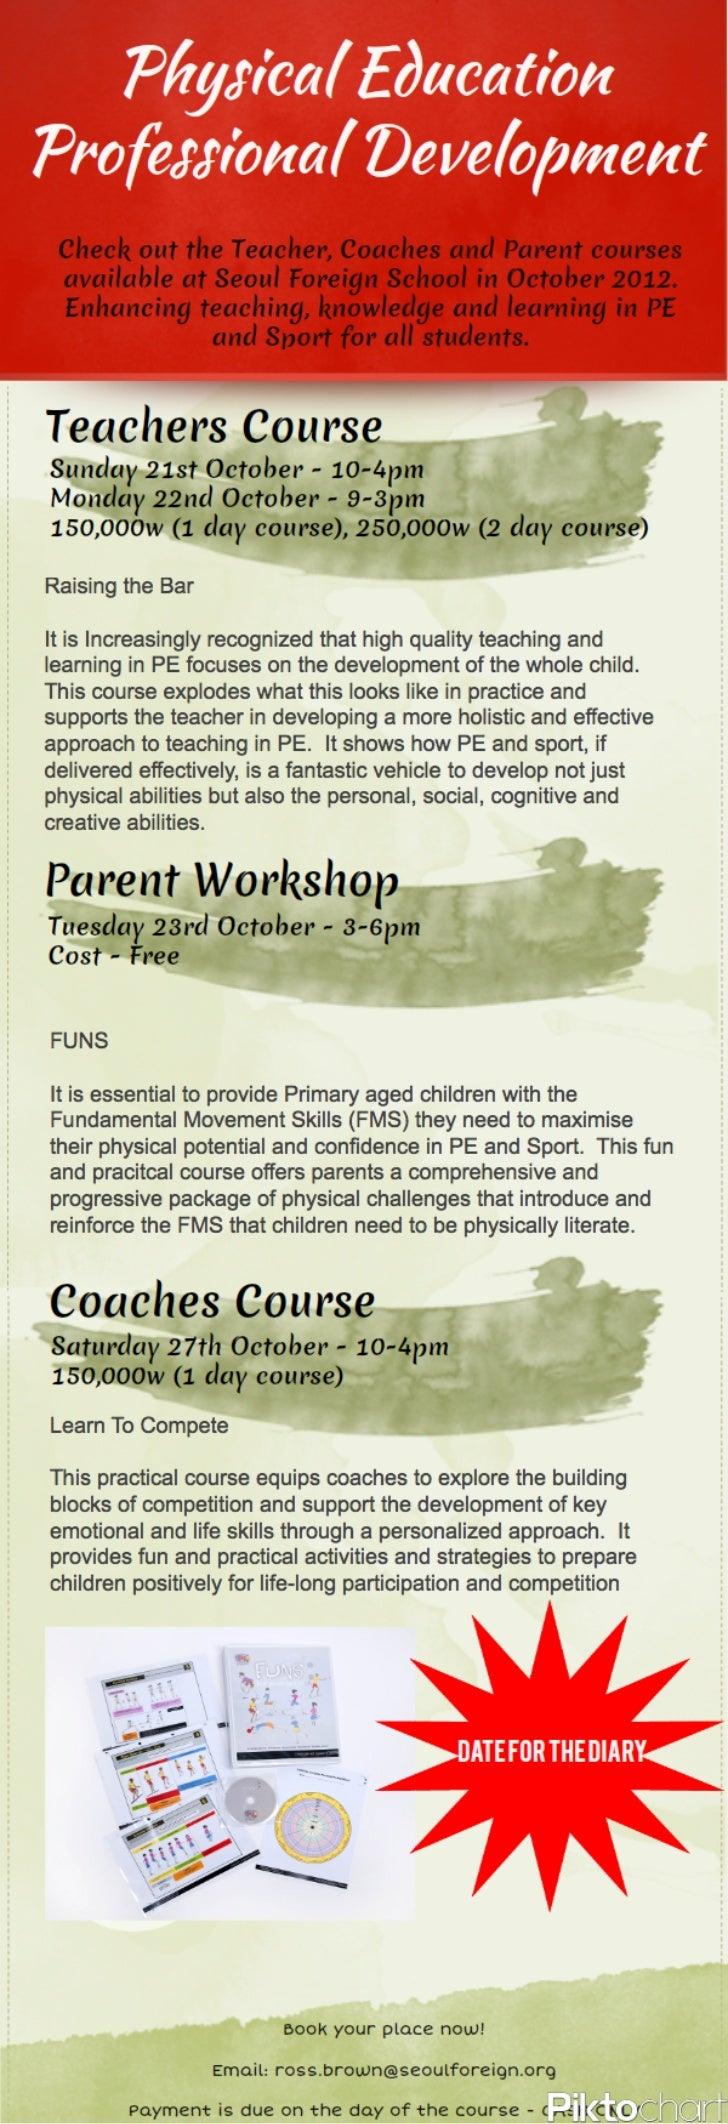 Physical education professional development 2012[3]